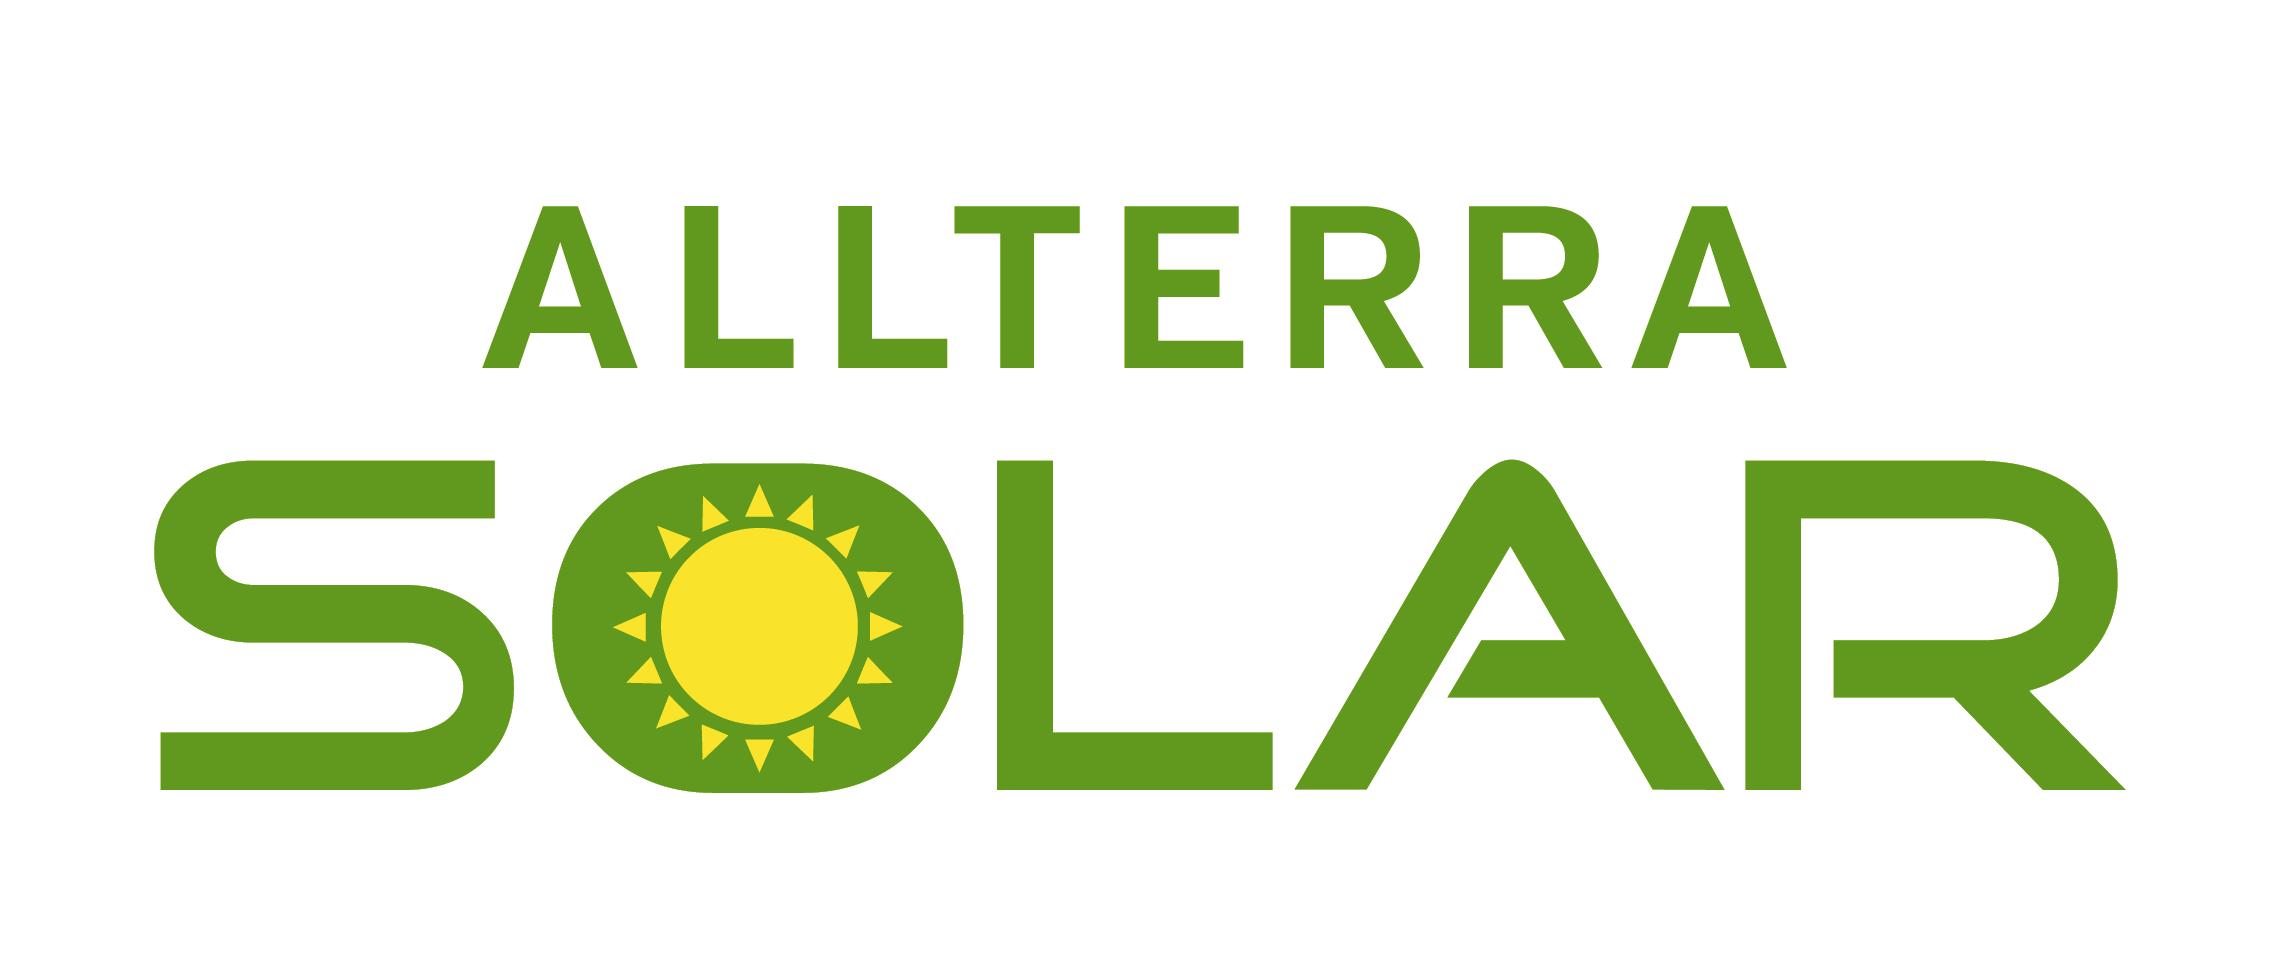 AllterraLogo.png